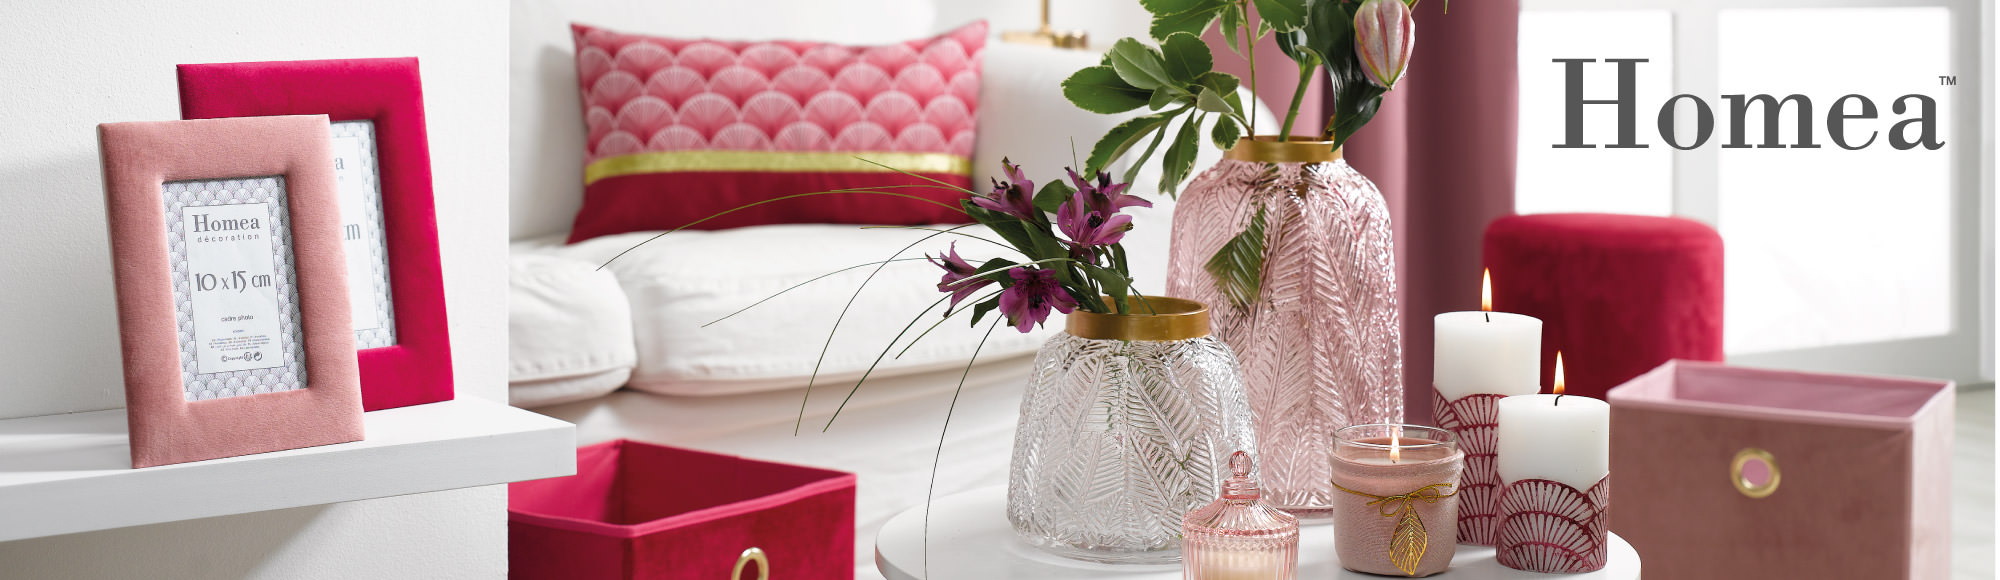 U10 – Homea brand – Boudoir gold theme - frames, candles…